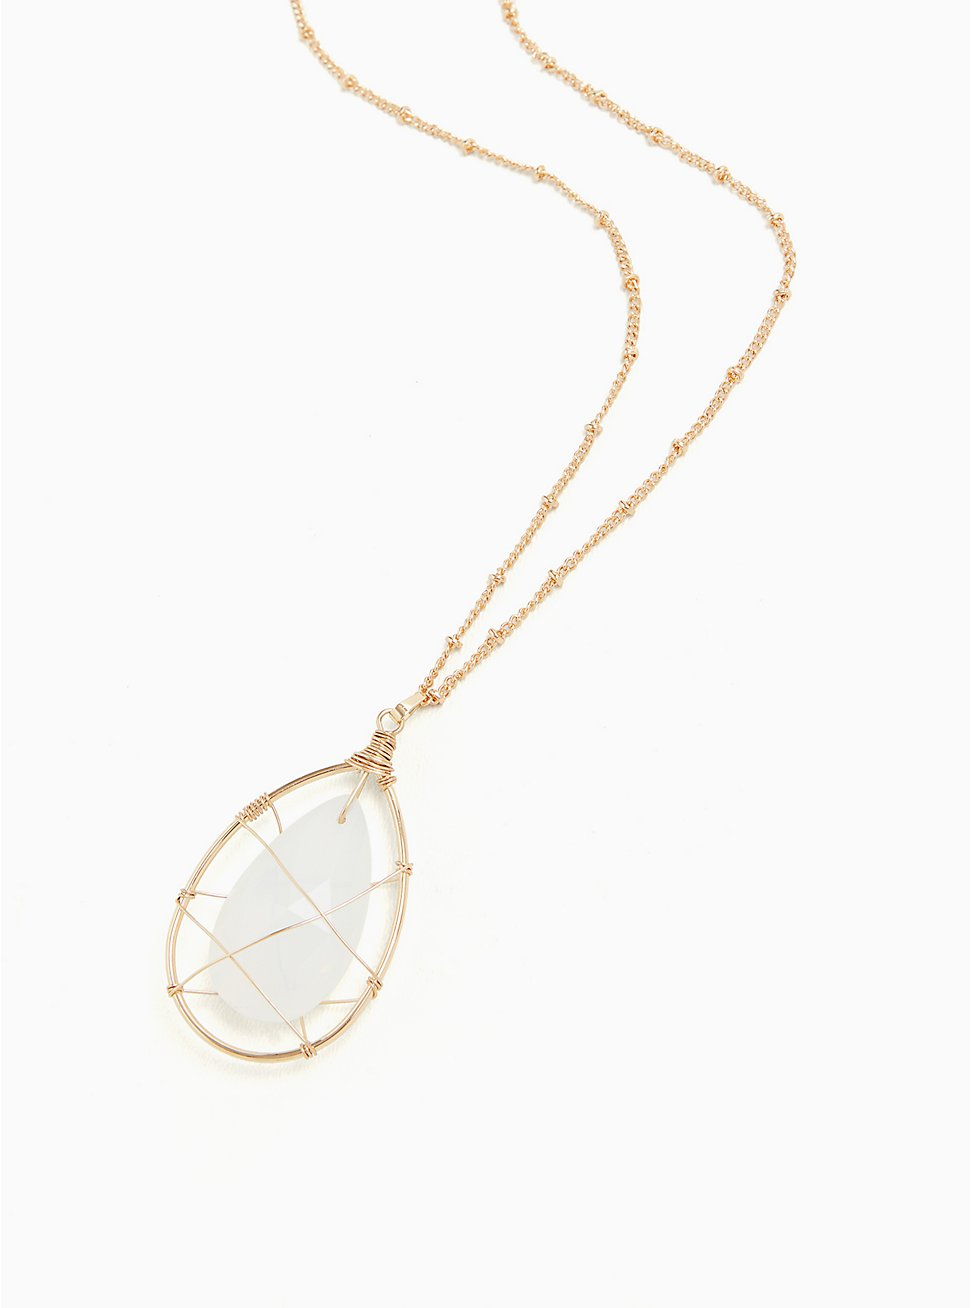 Gold-Tone Wire & White Faux Iris Stone Pendant Necklace , , hi-res